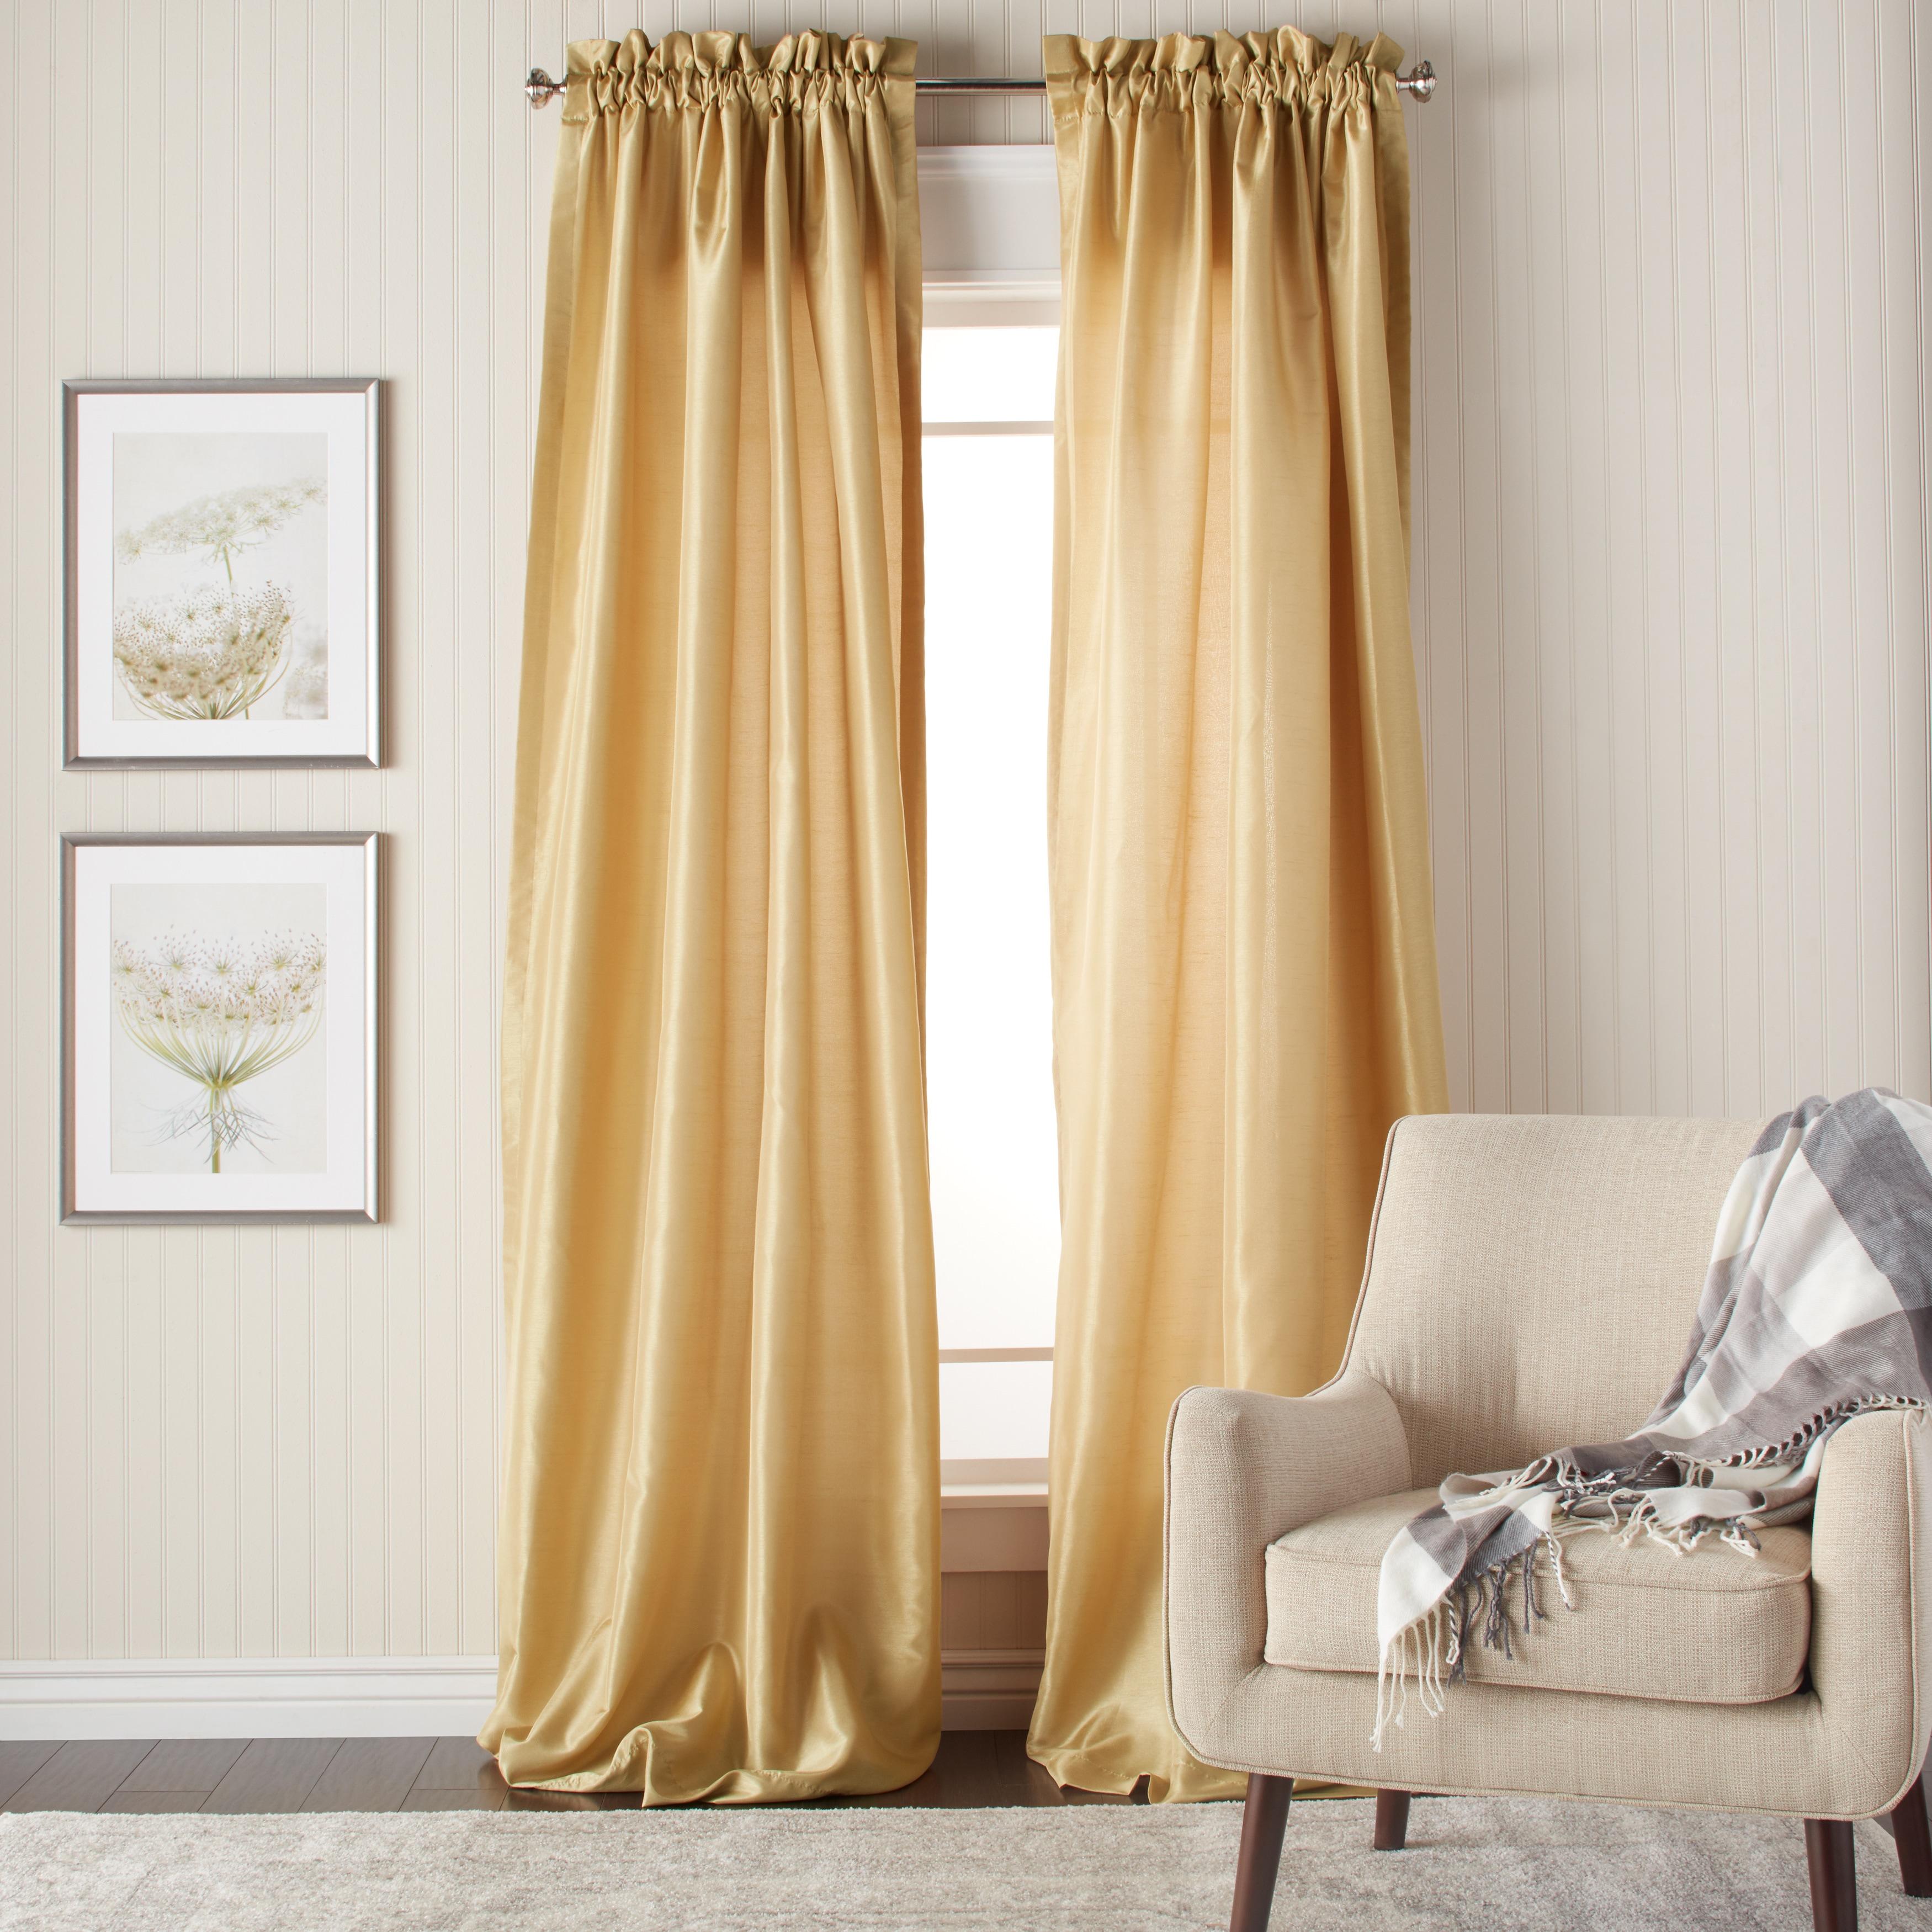 Home Furniture Diy Curtains Pelmets Set 2 Faux Silk Taupe Brown Window Curtains Panels Drapes Pair 96 Inch L Elegant Bortexgroup Com